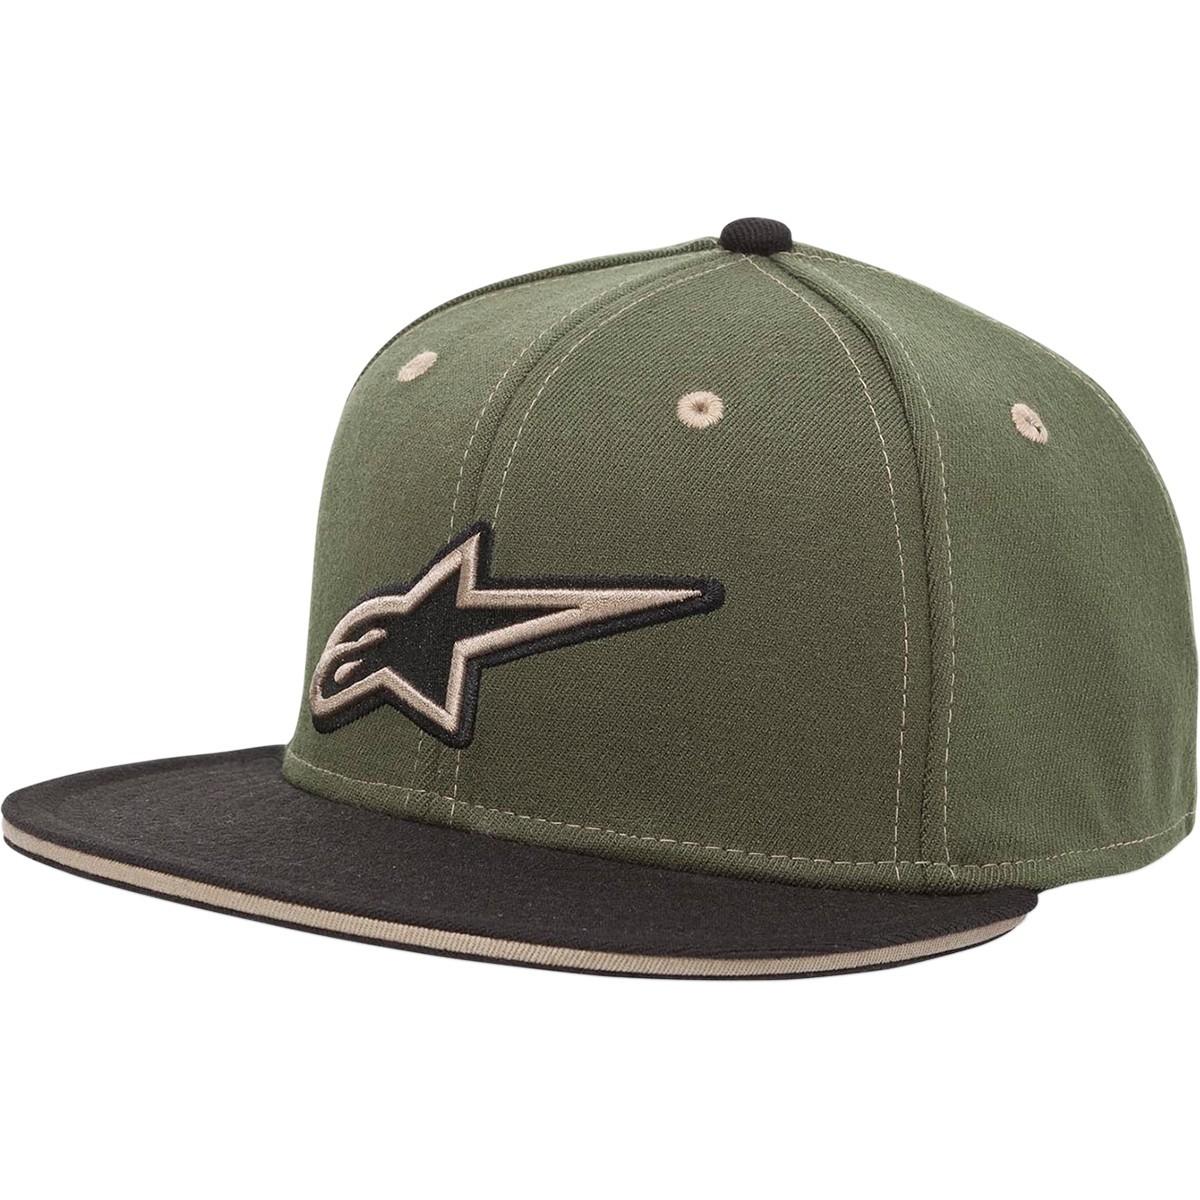 Alpinestars Sussex Flatbill Hat